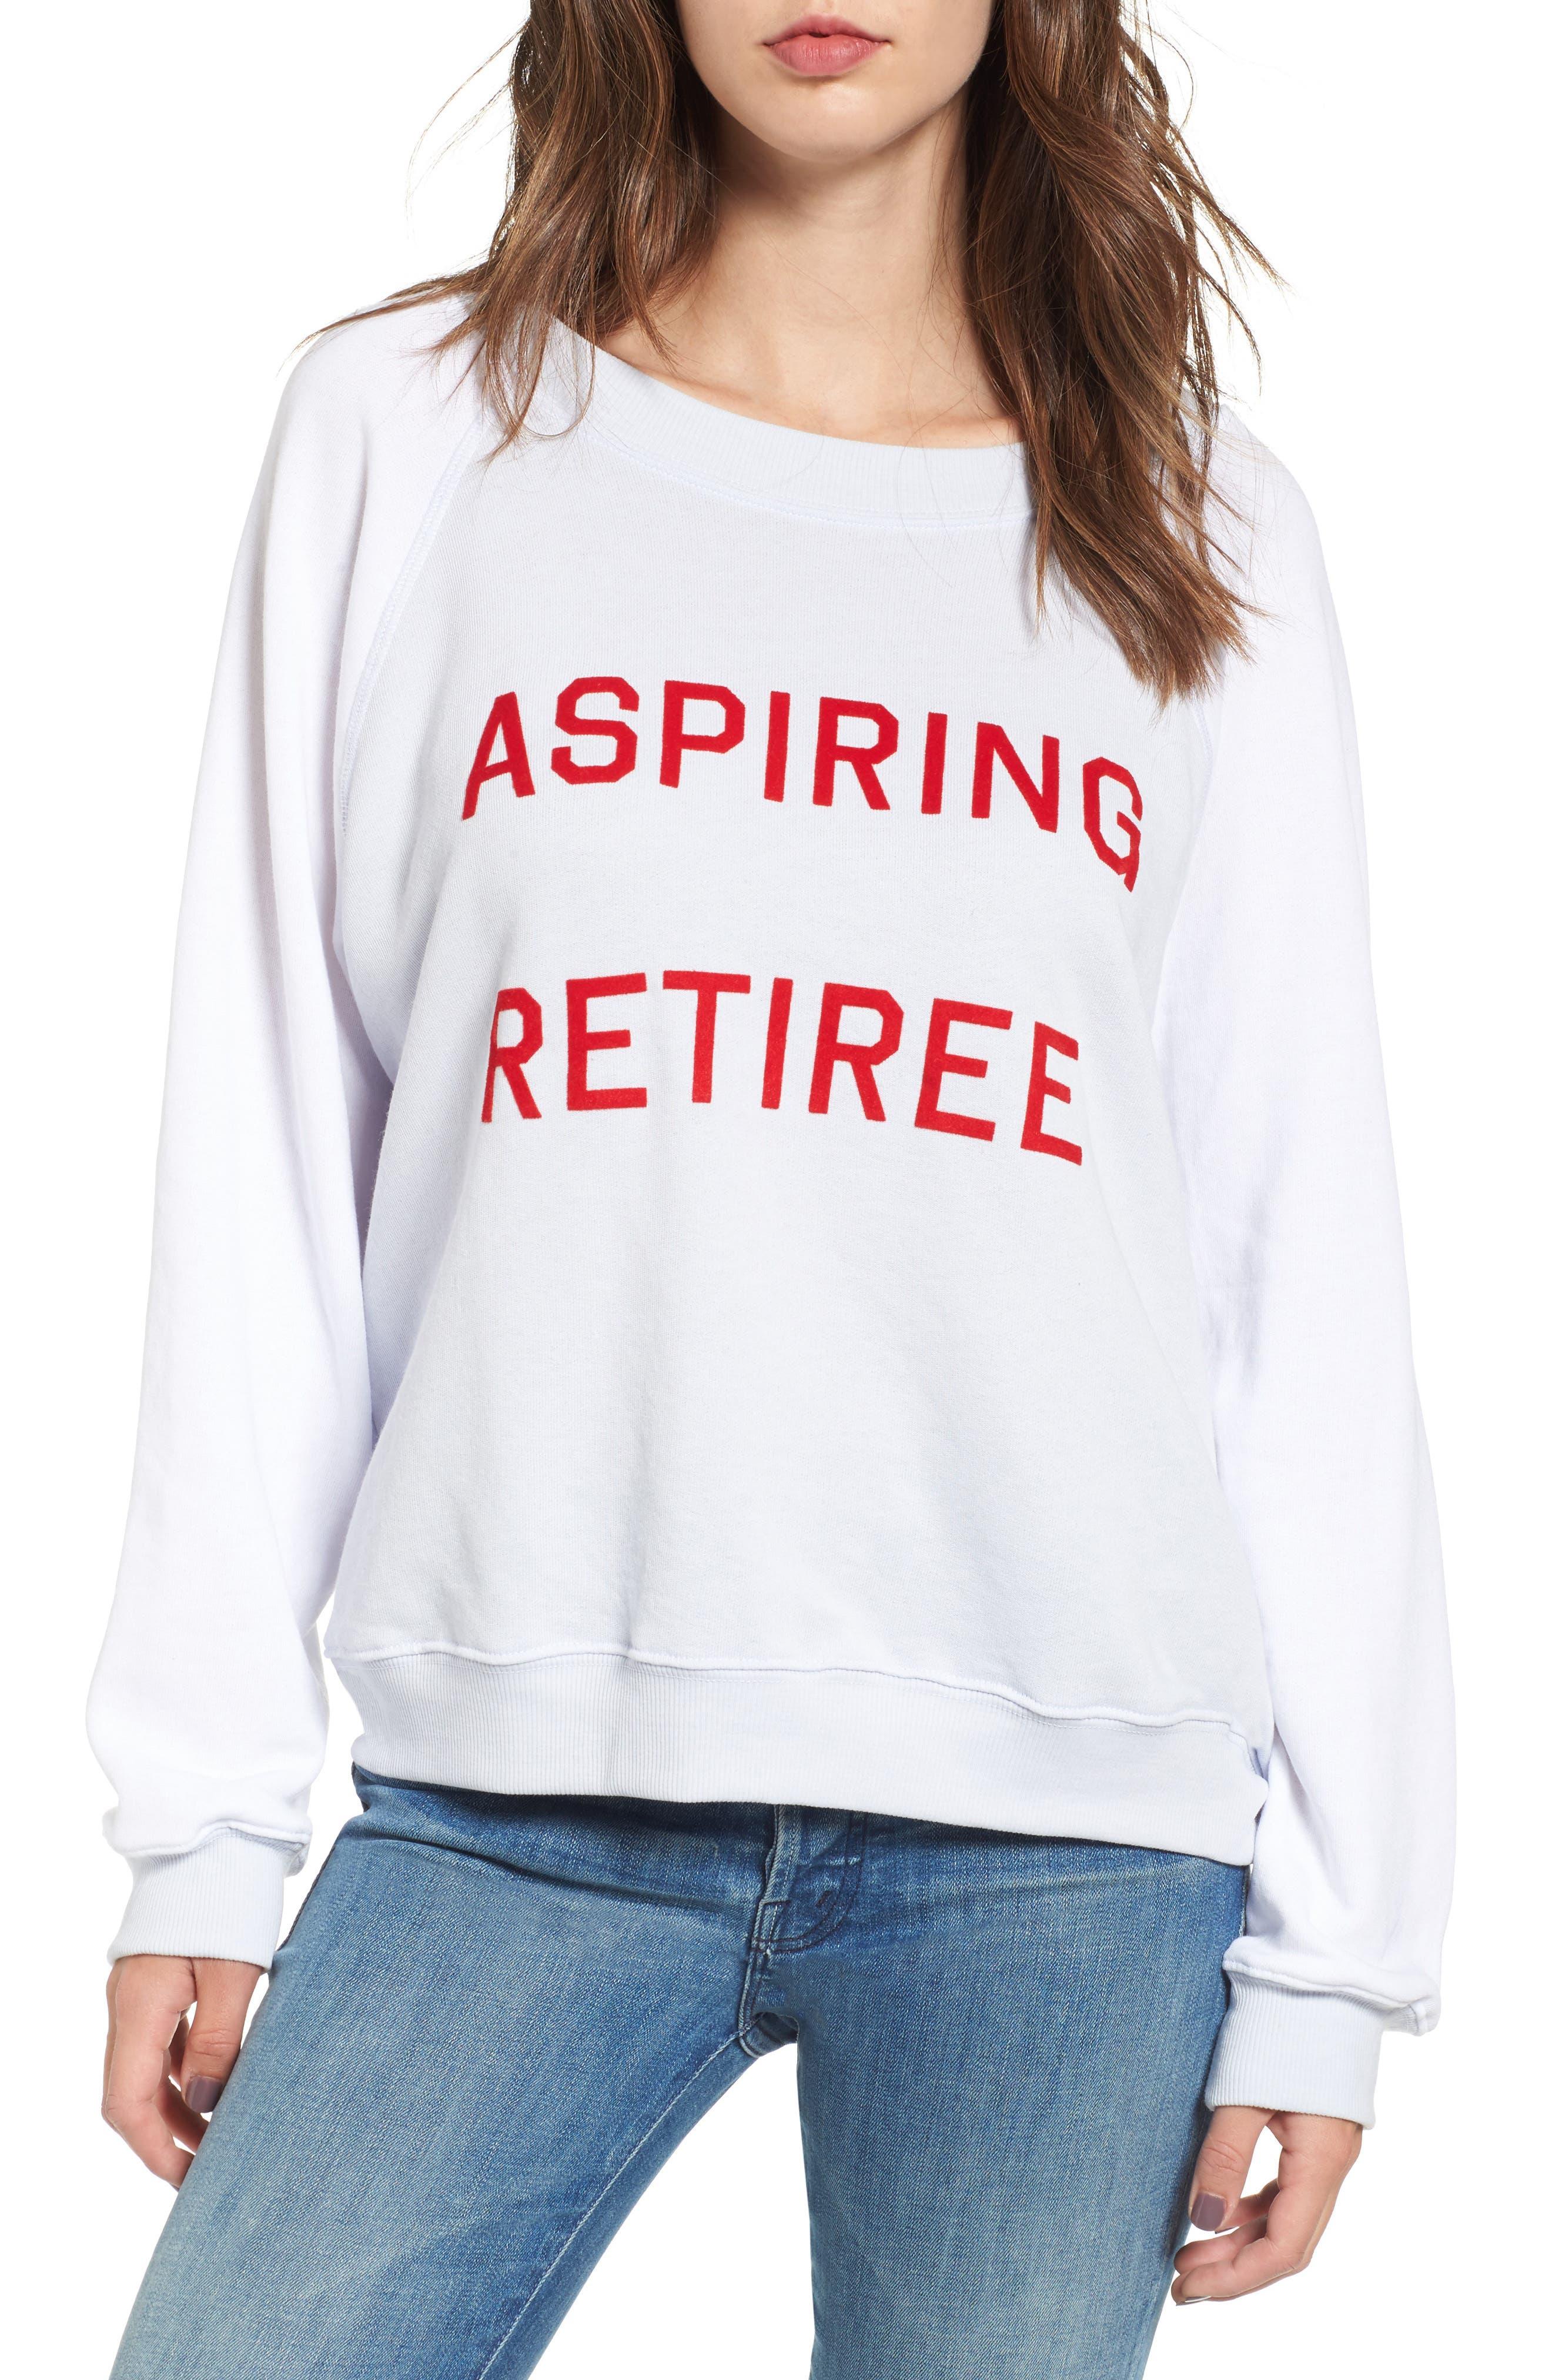 Aspiring Retiree Sweatshirt,                             Main thumbnail 1, color,